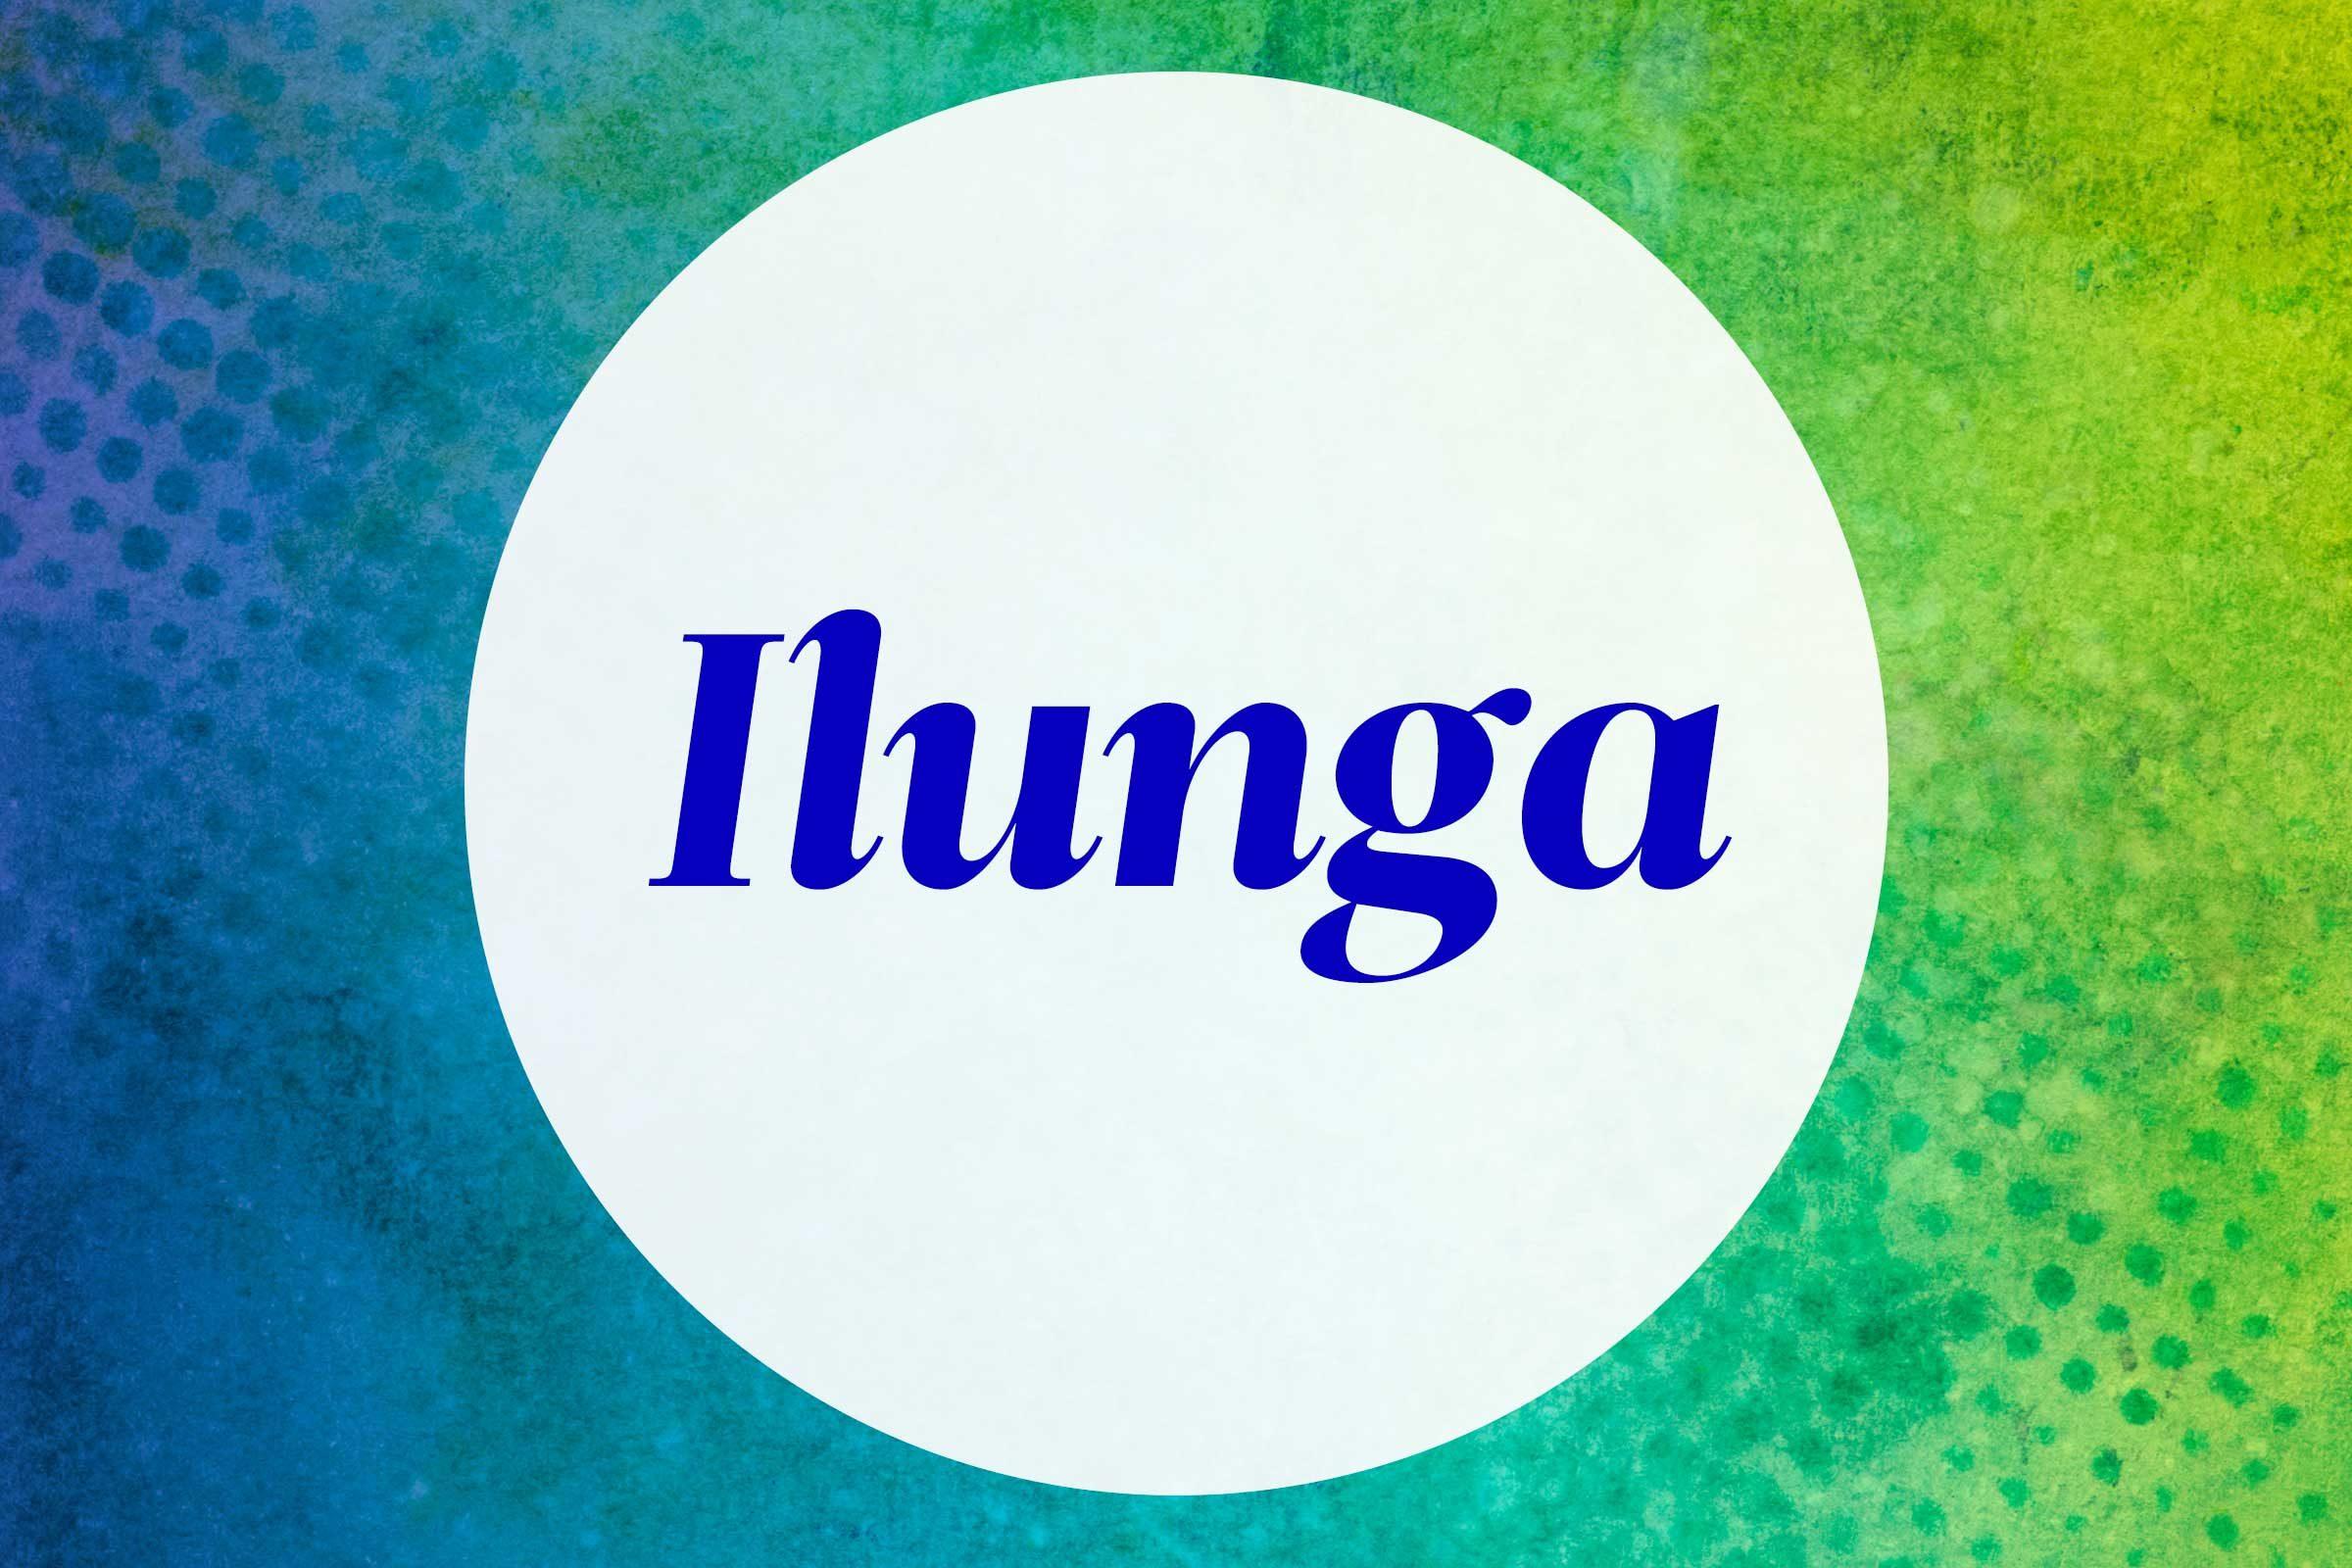 Ilunga